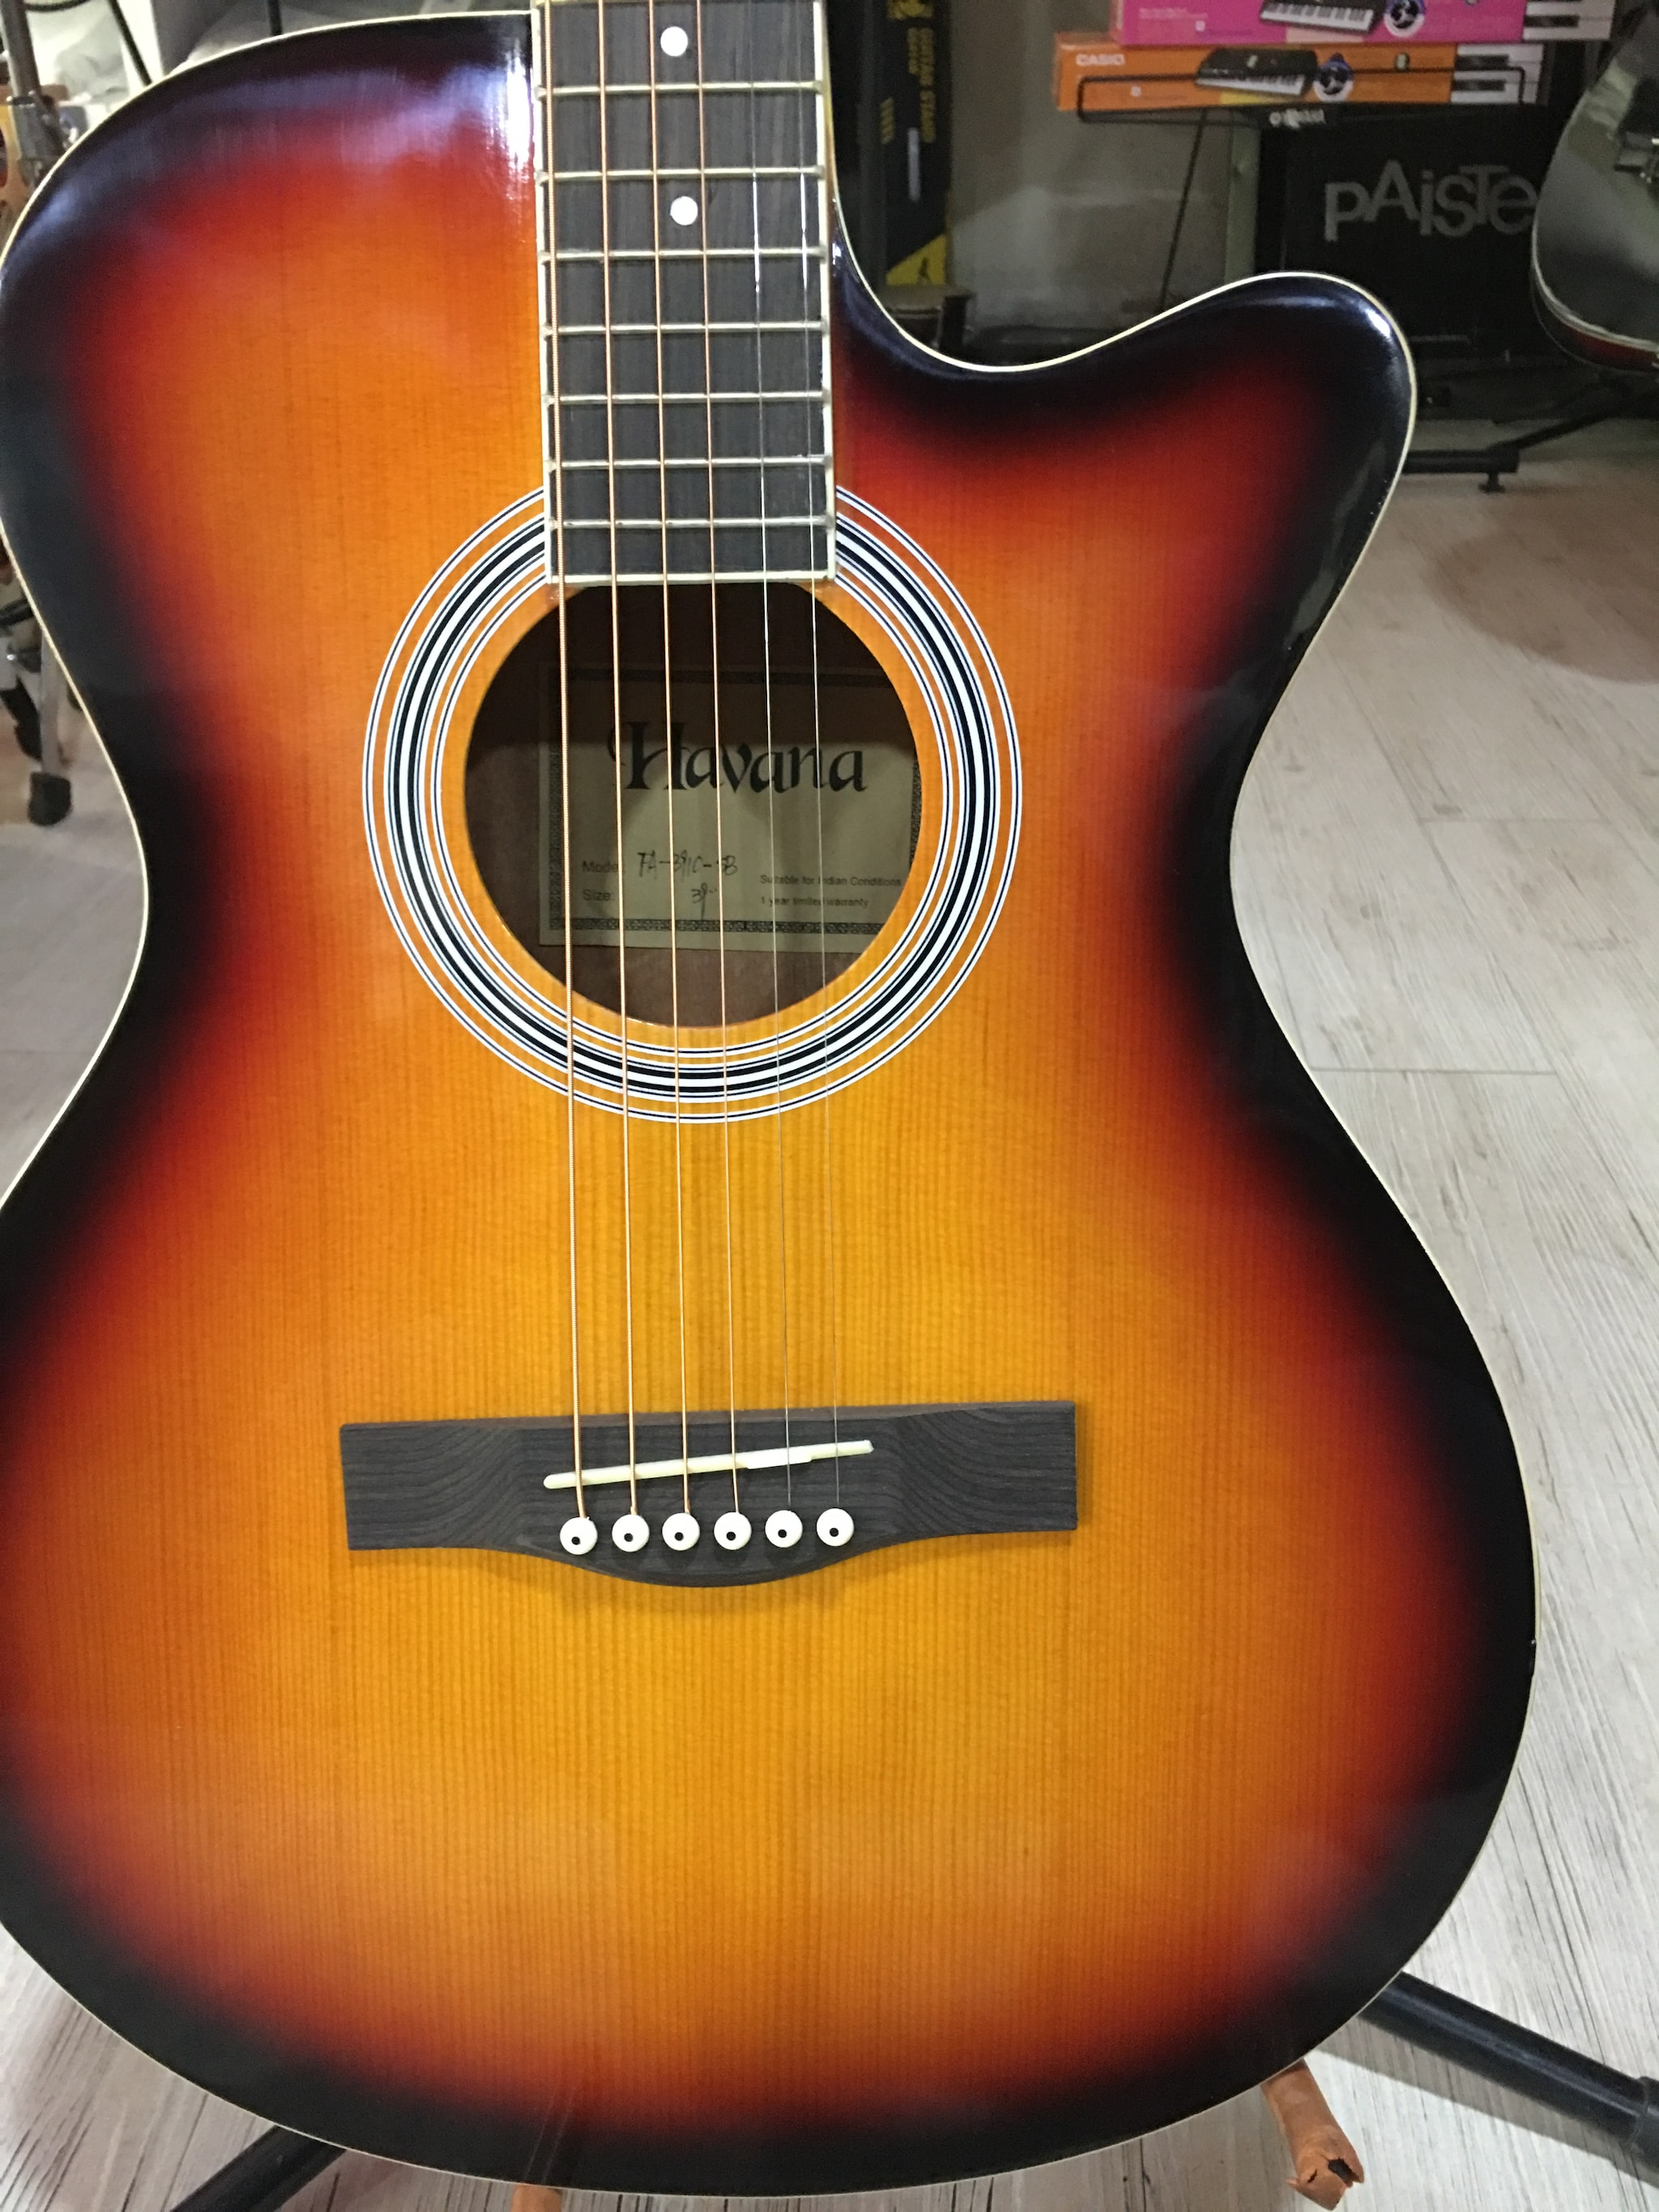 Havana FA-391C Acoustic Guitar (SB)